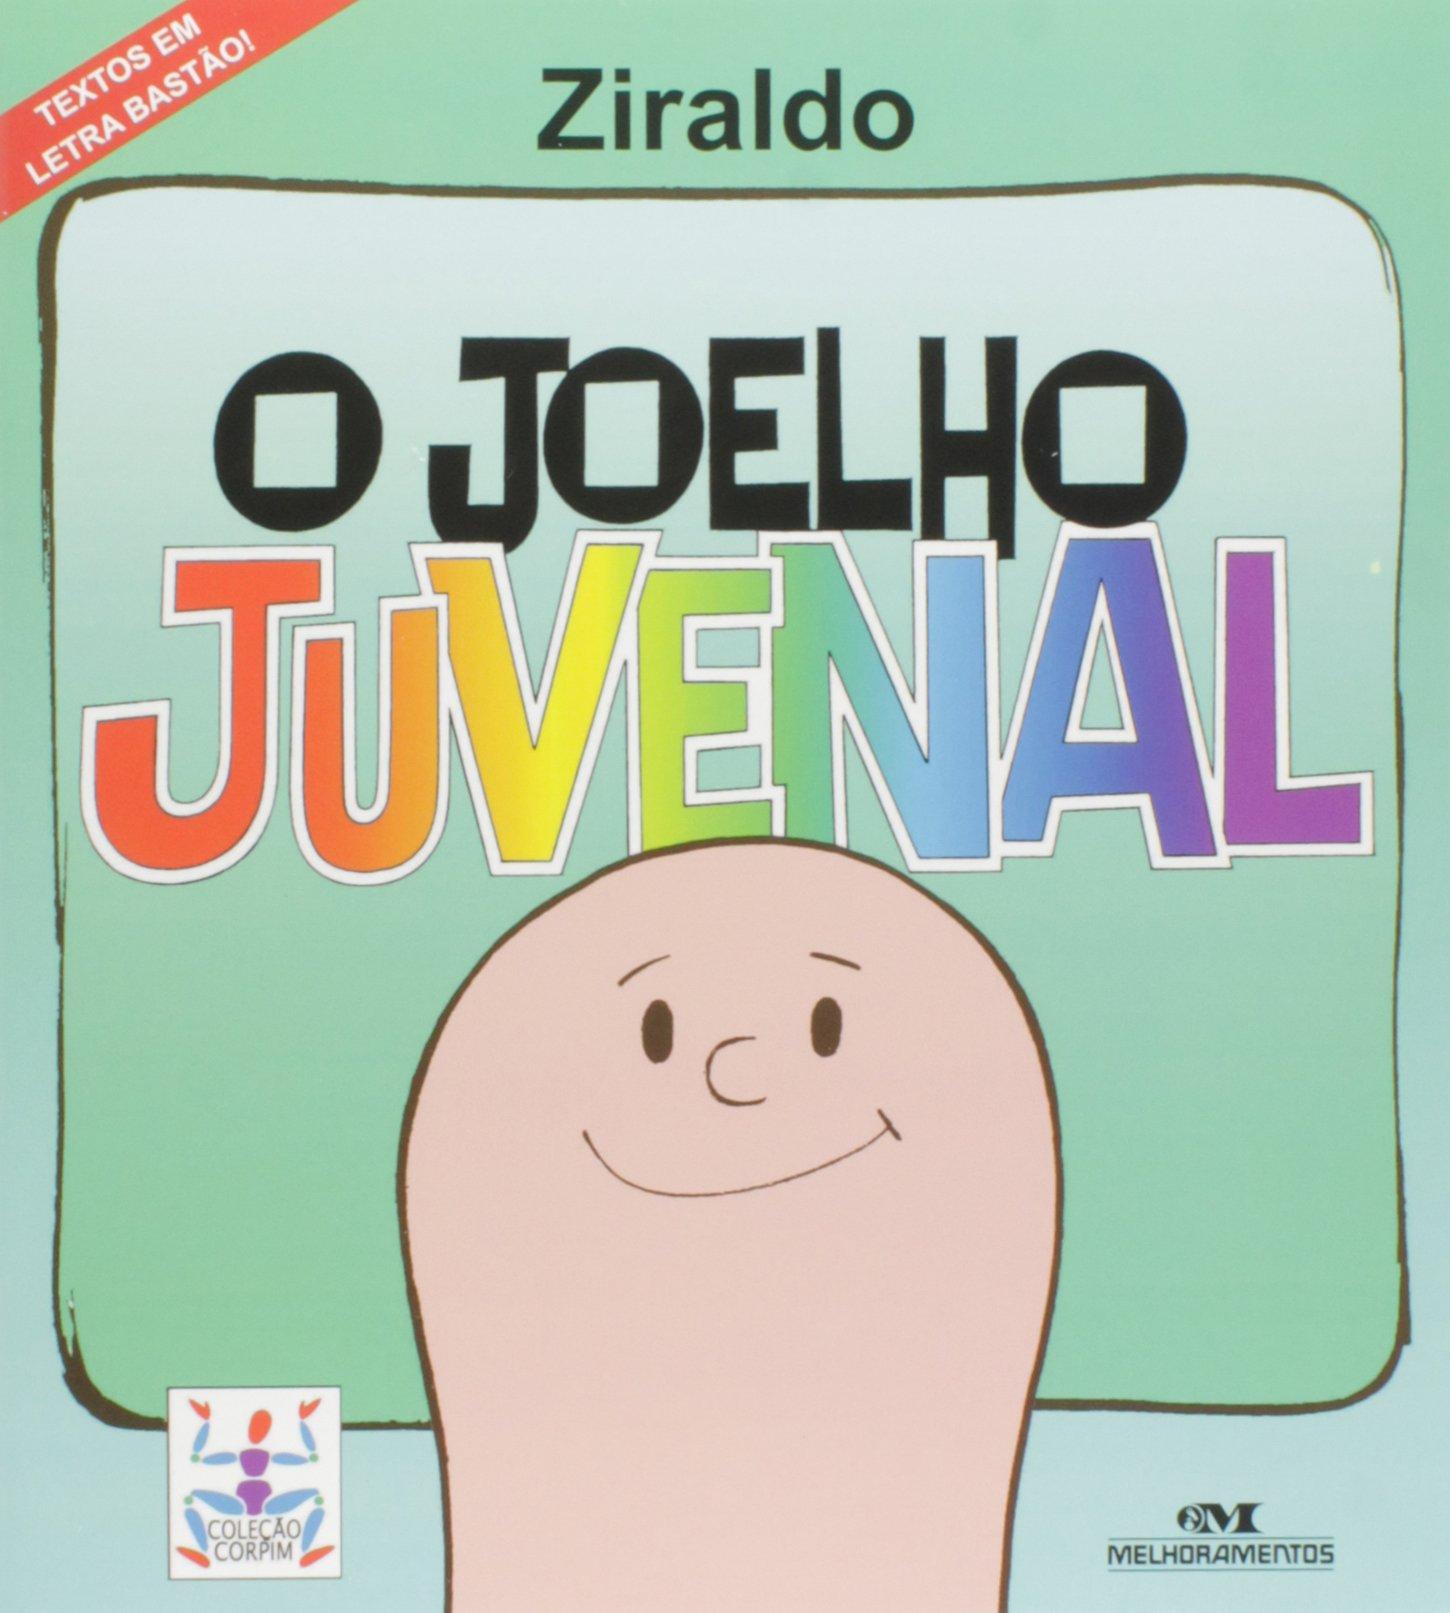 O Joelho Juvenal - 9788506055694 - Livros na Amazon Brasil